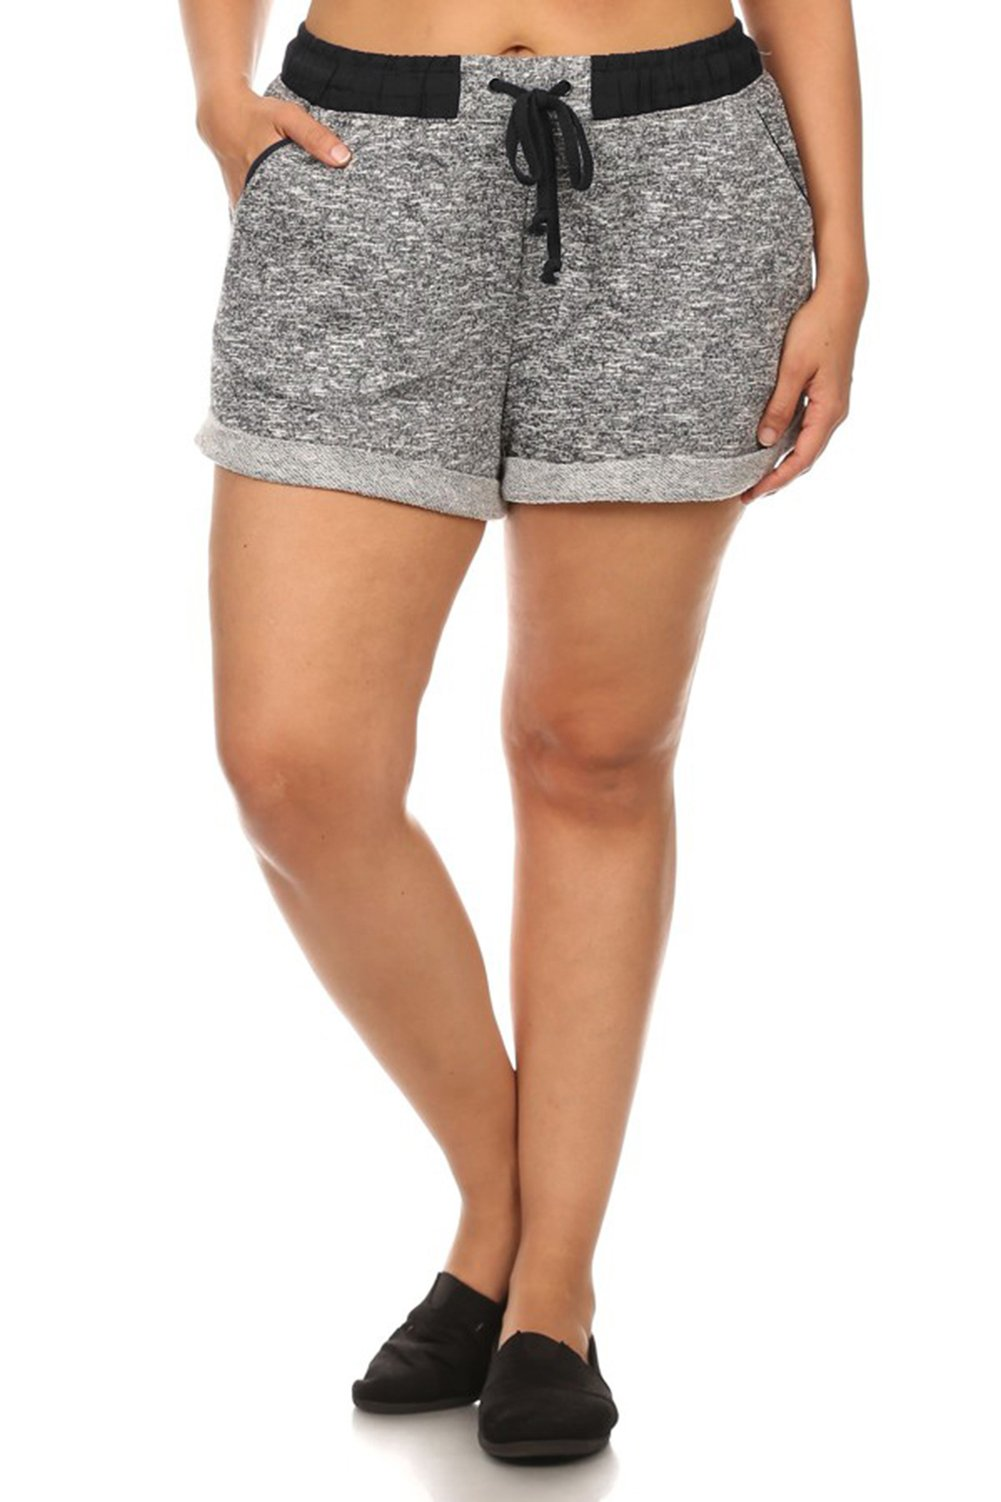 Vialumi Women's Junior Plus Elastic Drawstring Waist Cuffed Shorts Grey Black 1X